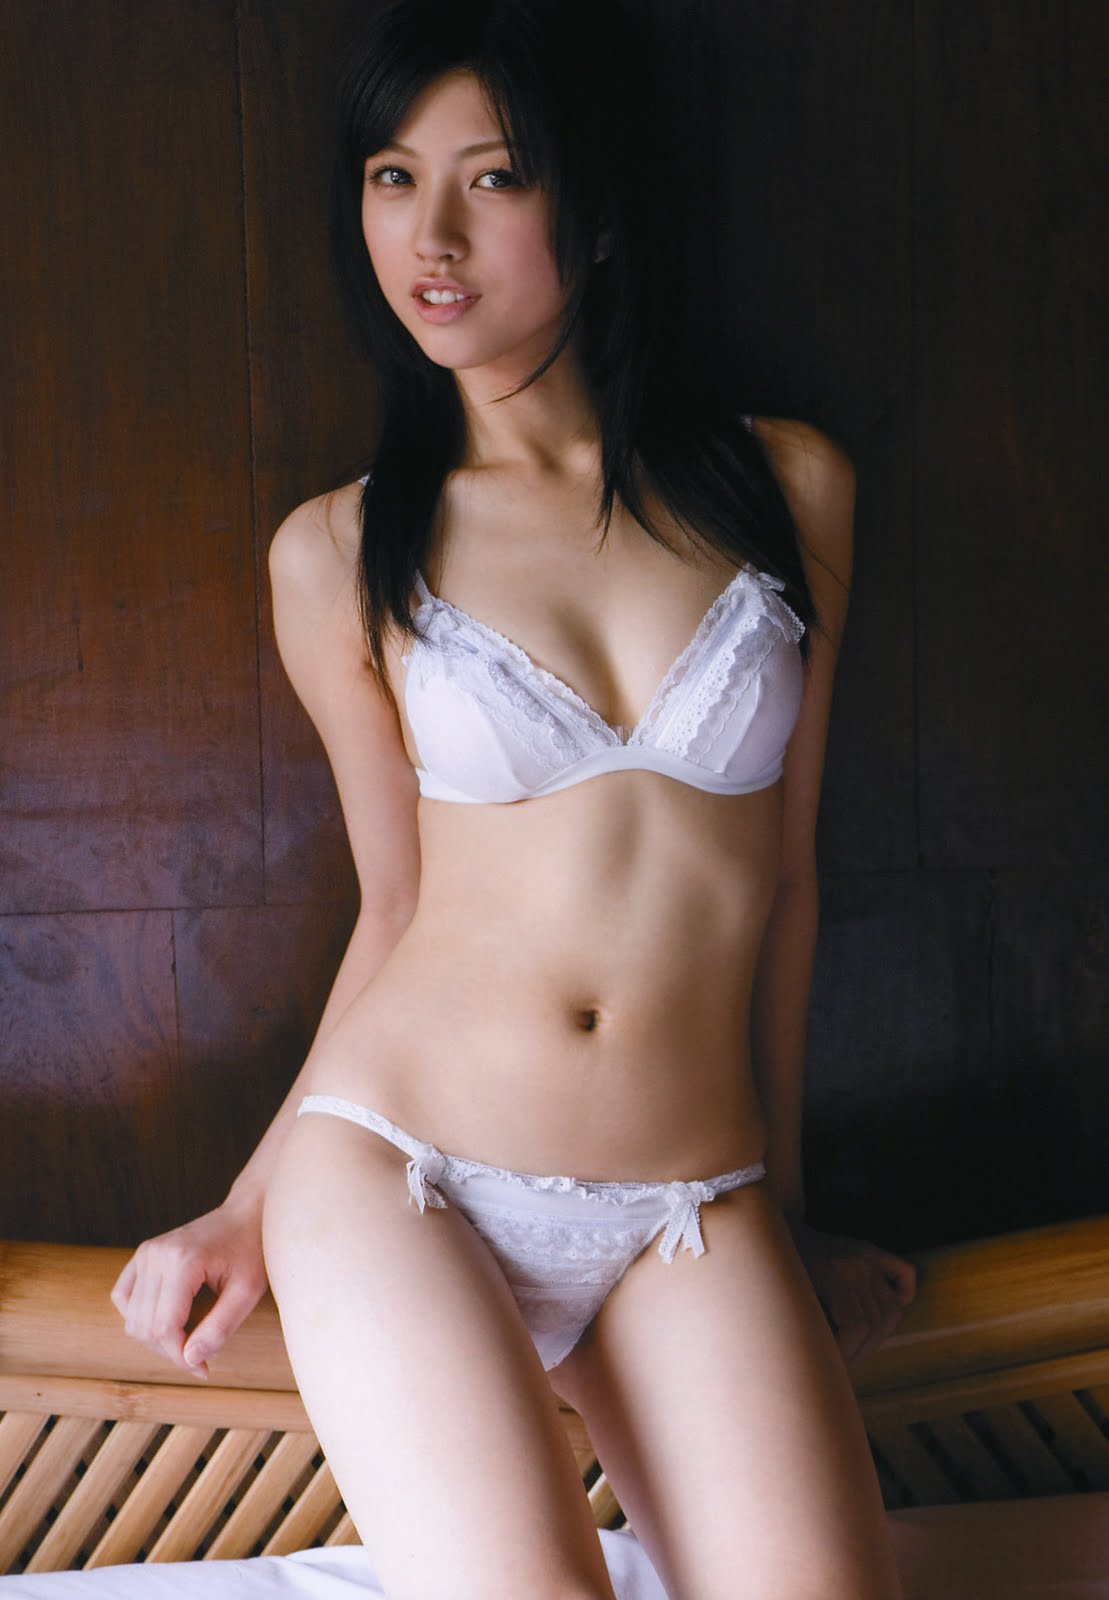 image Hot desi babe making her first desi sex video